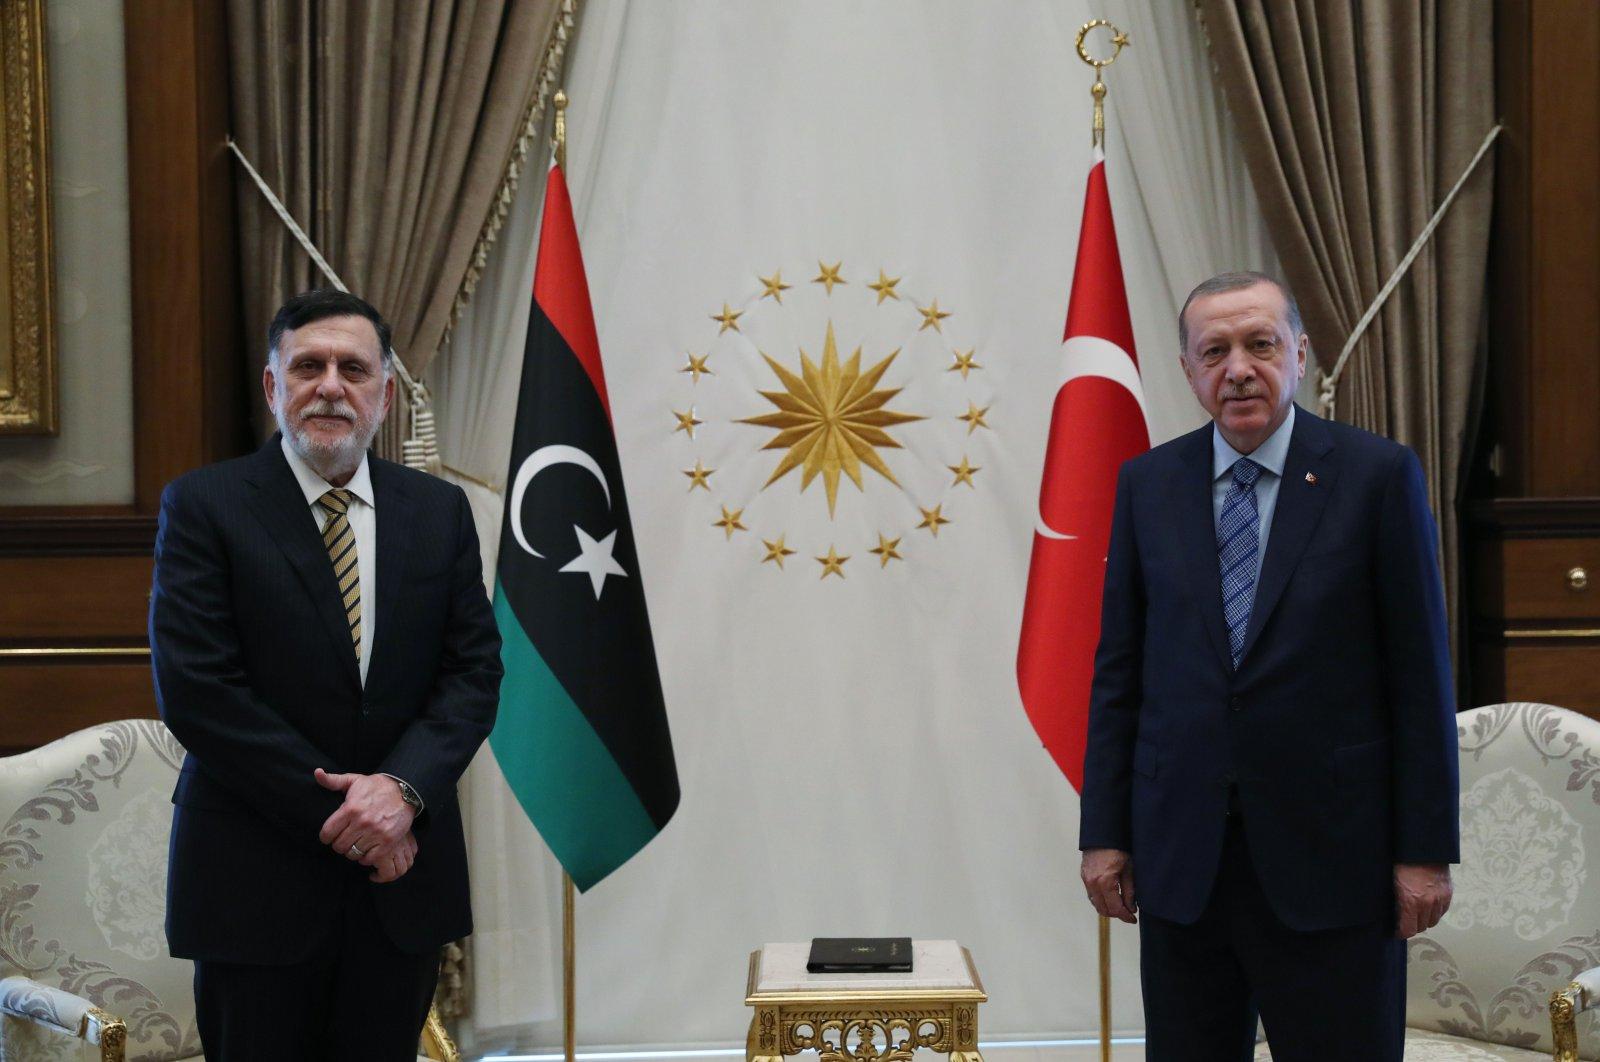 President Recep Tayyip Erdoğan meets with Libyan Prime Minister Fayez Sarraj at the Presidential Complex in Ankara, Turkey, June 4, 2020. (AFP Photo)